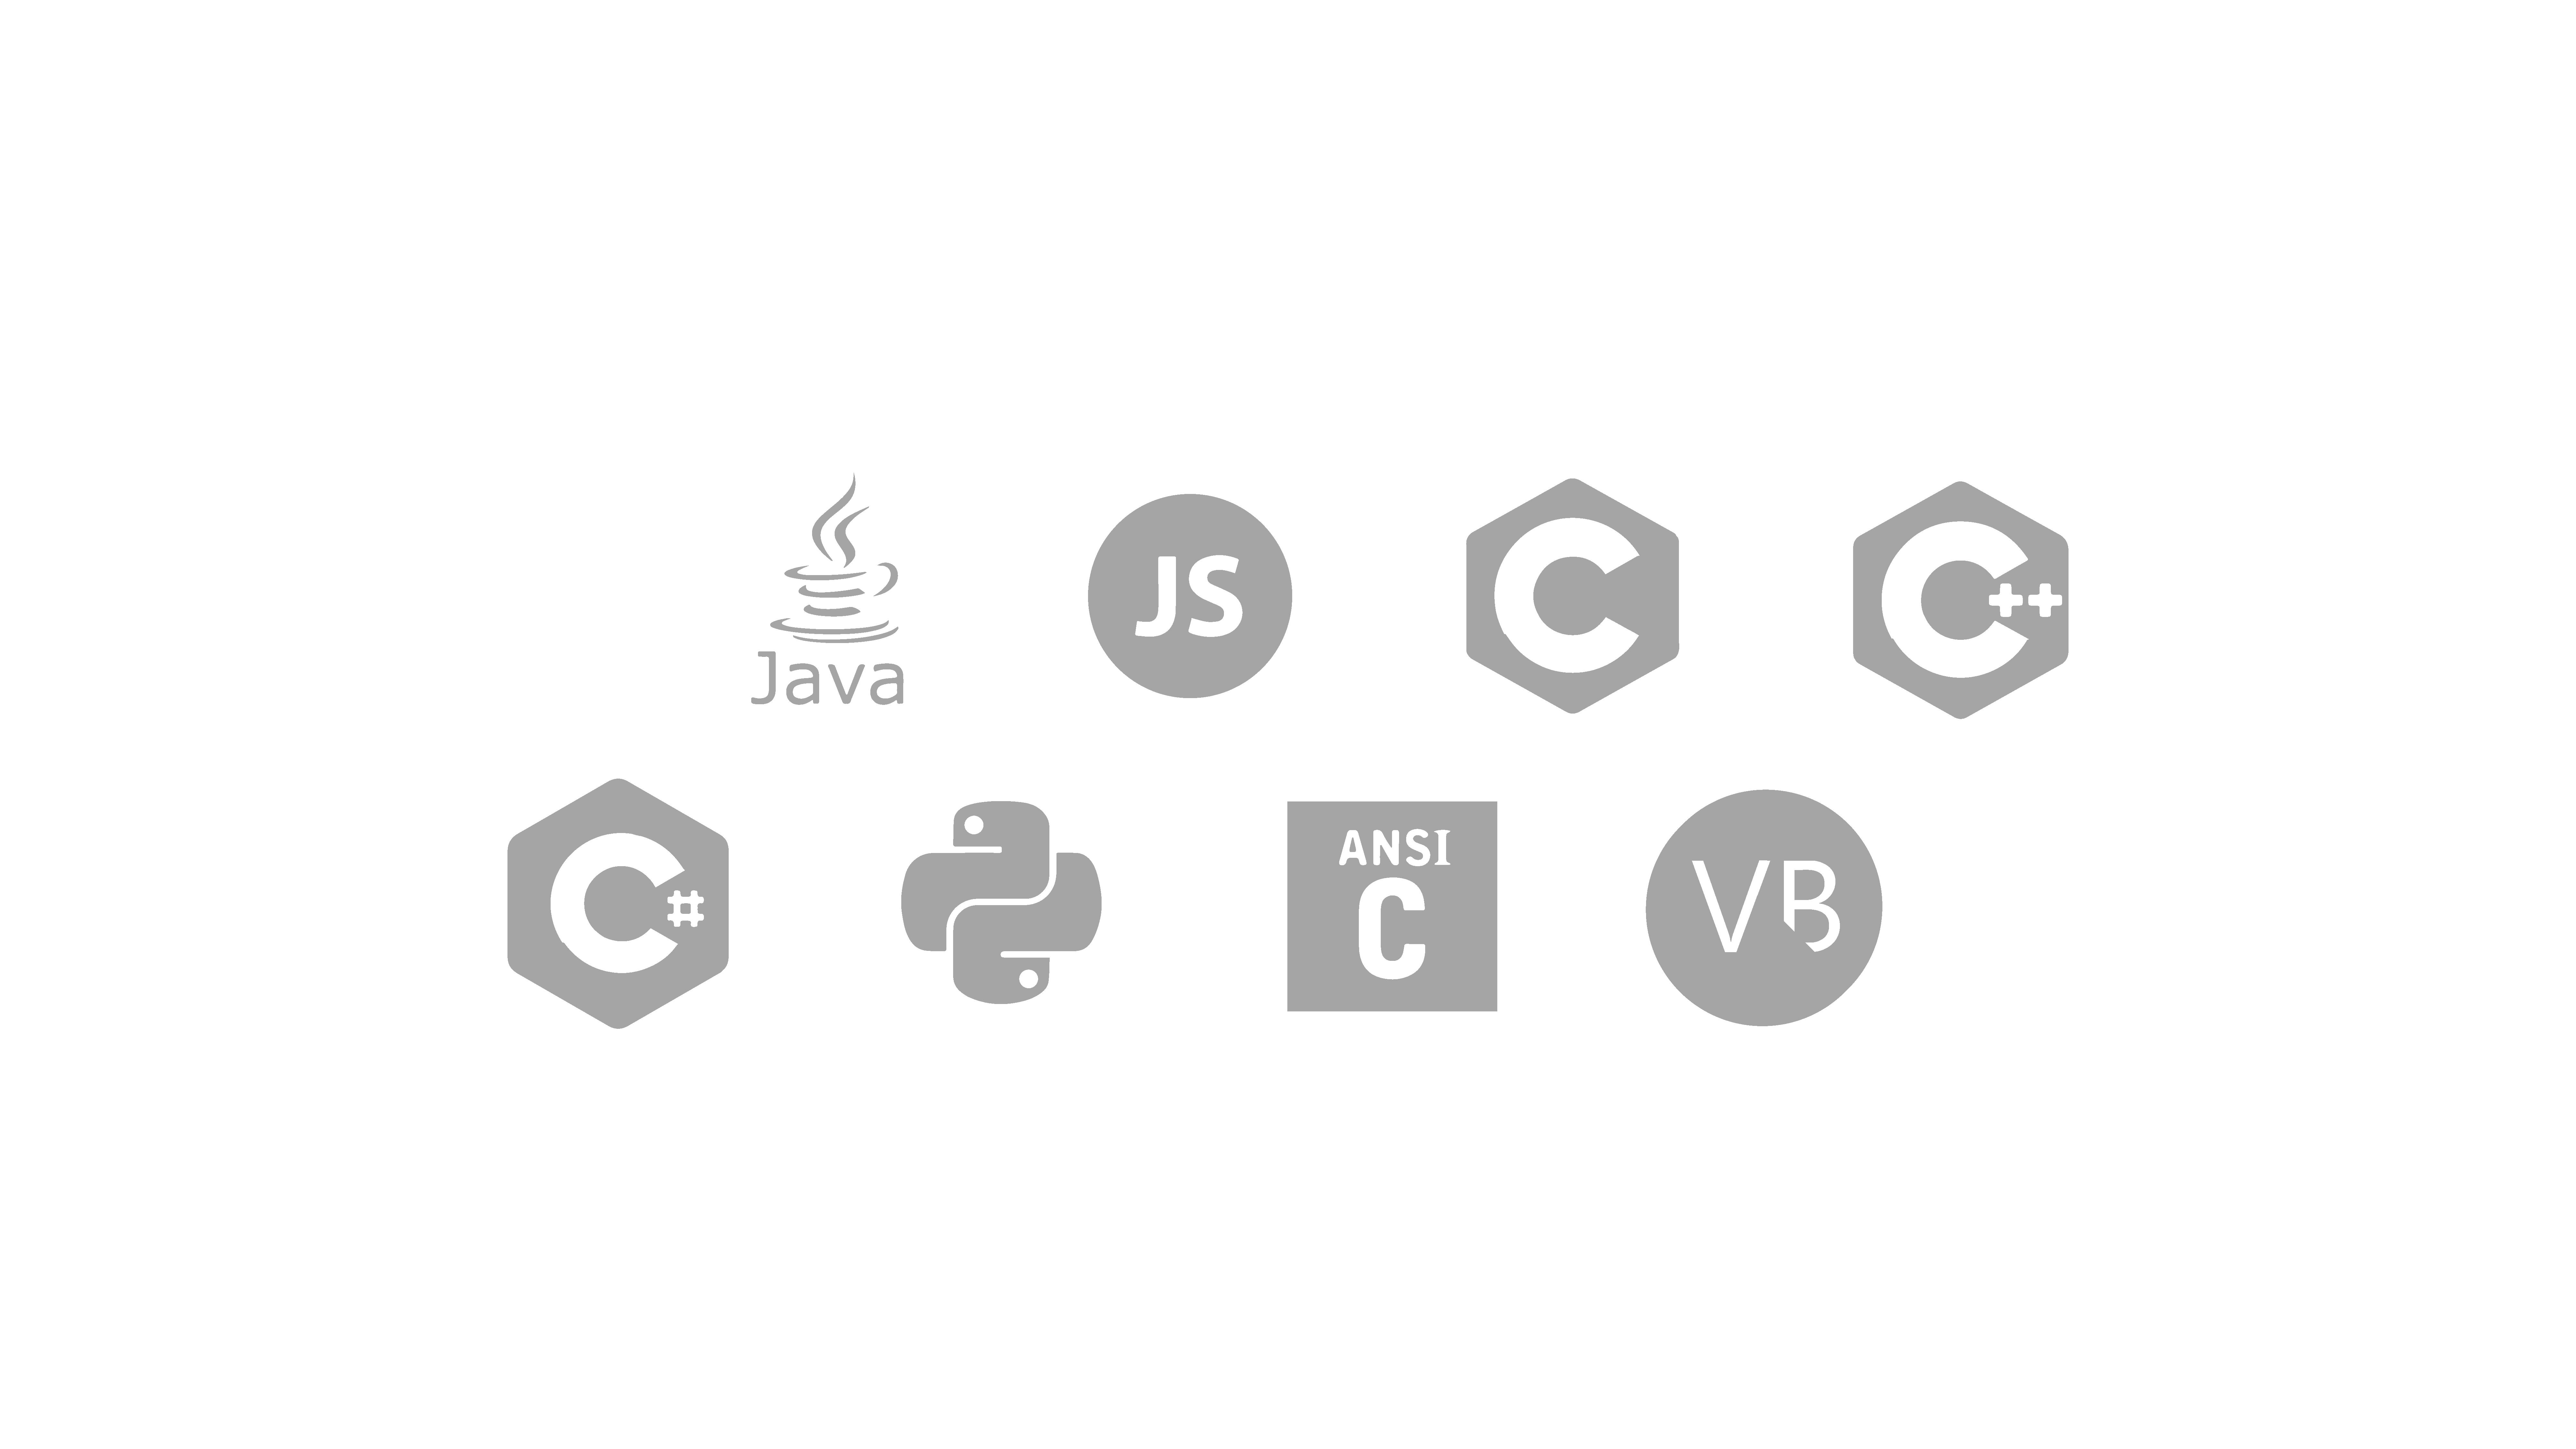 Logos de los lenguajes de programación que domina Pragma